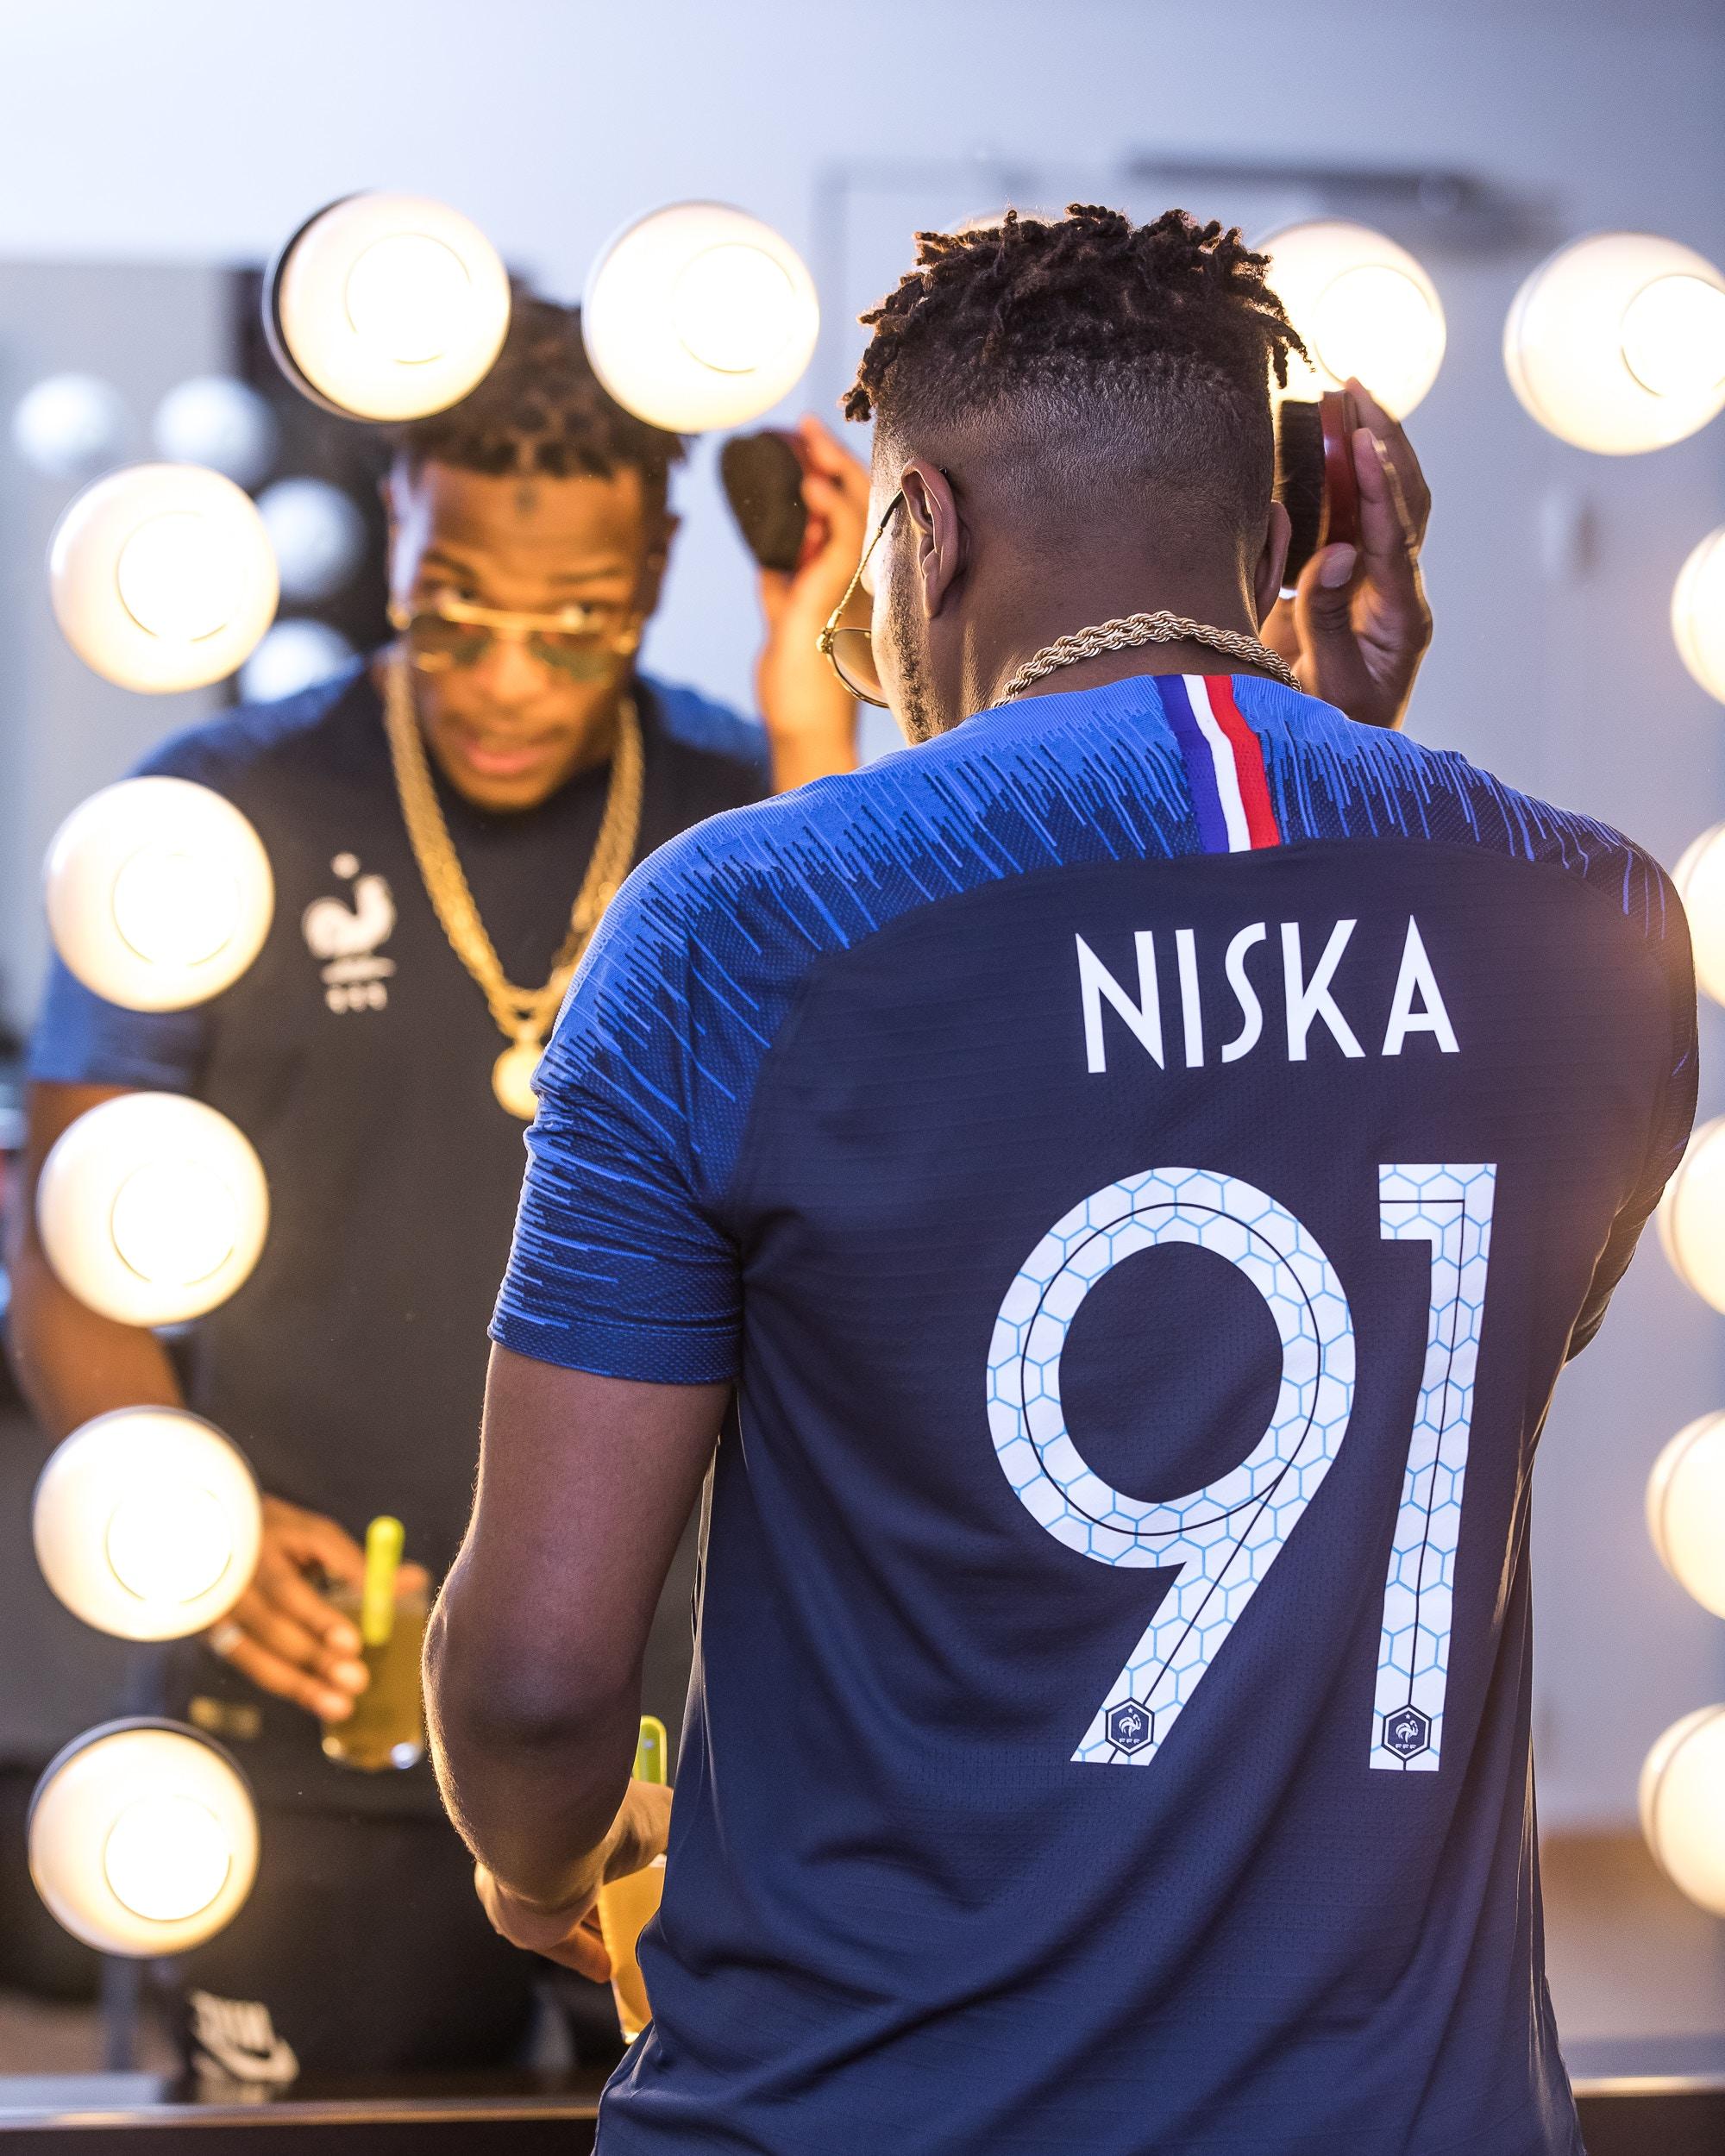 niska-maillot-france-nike-coupe-du-monde-1